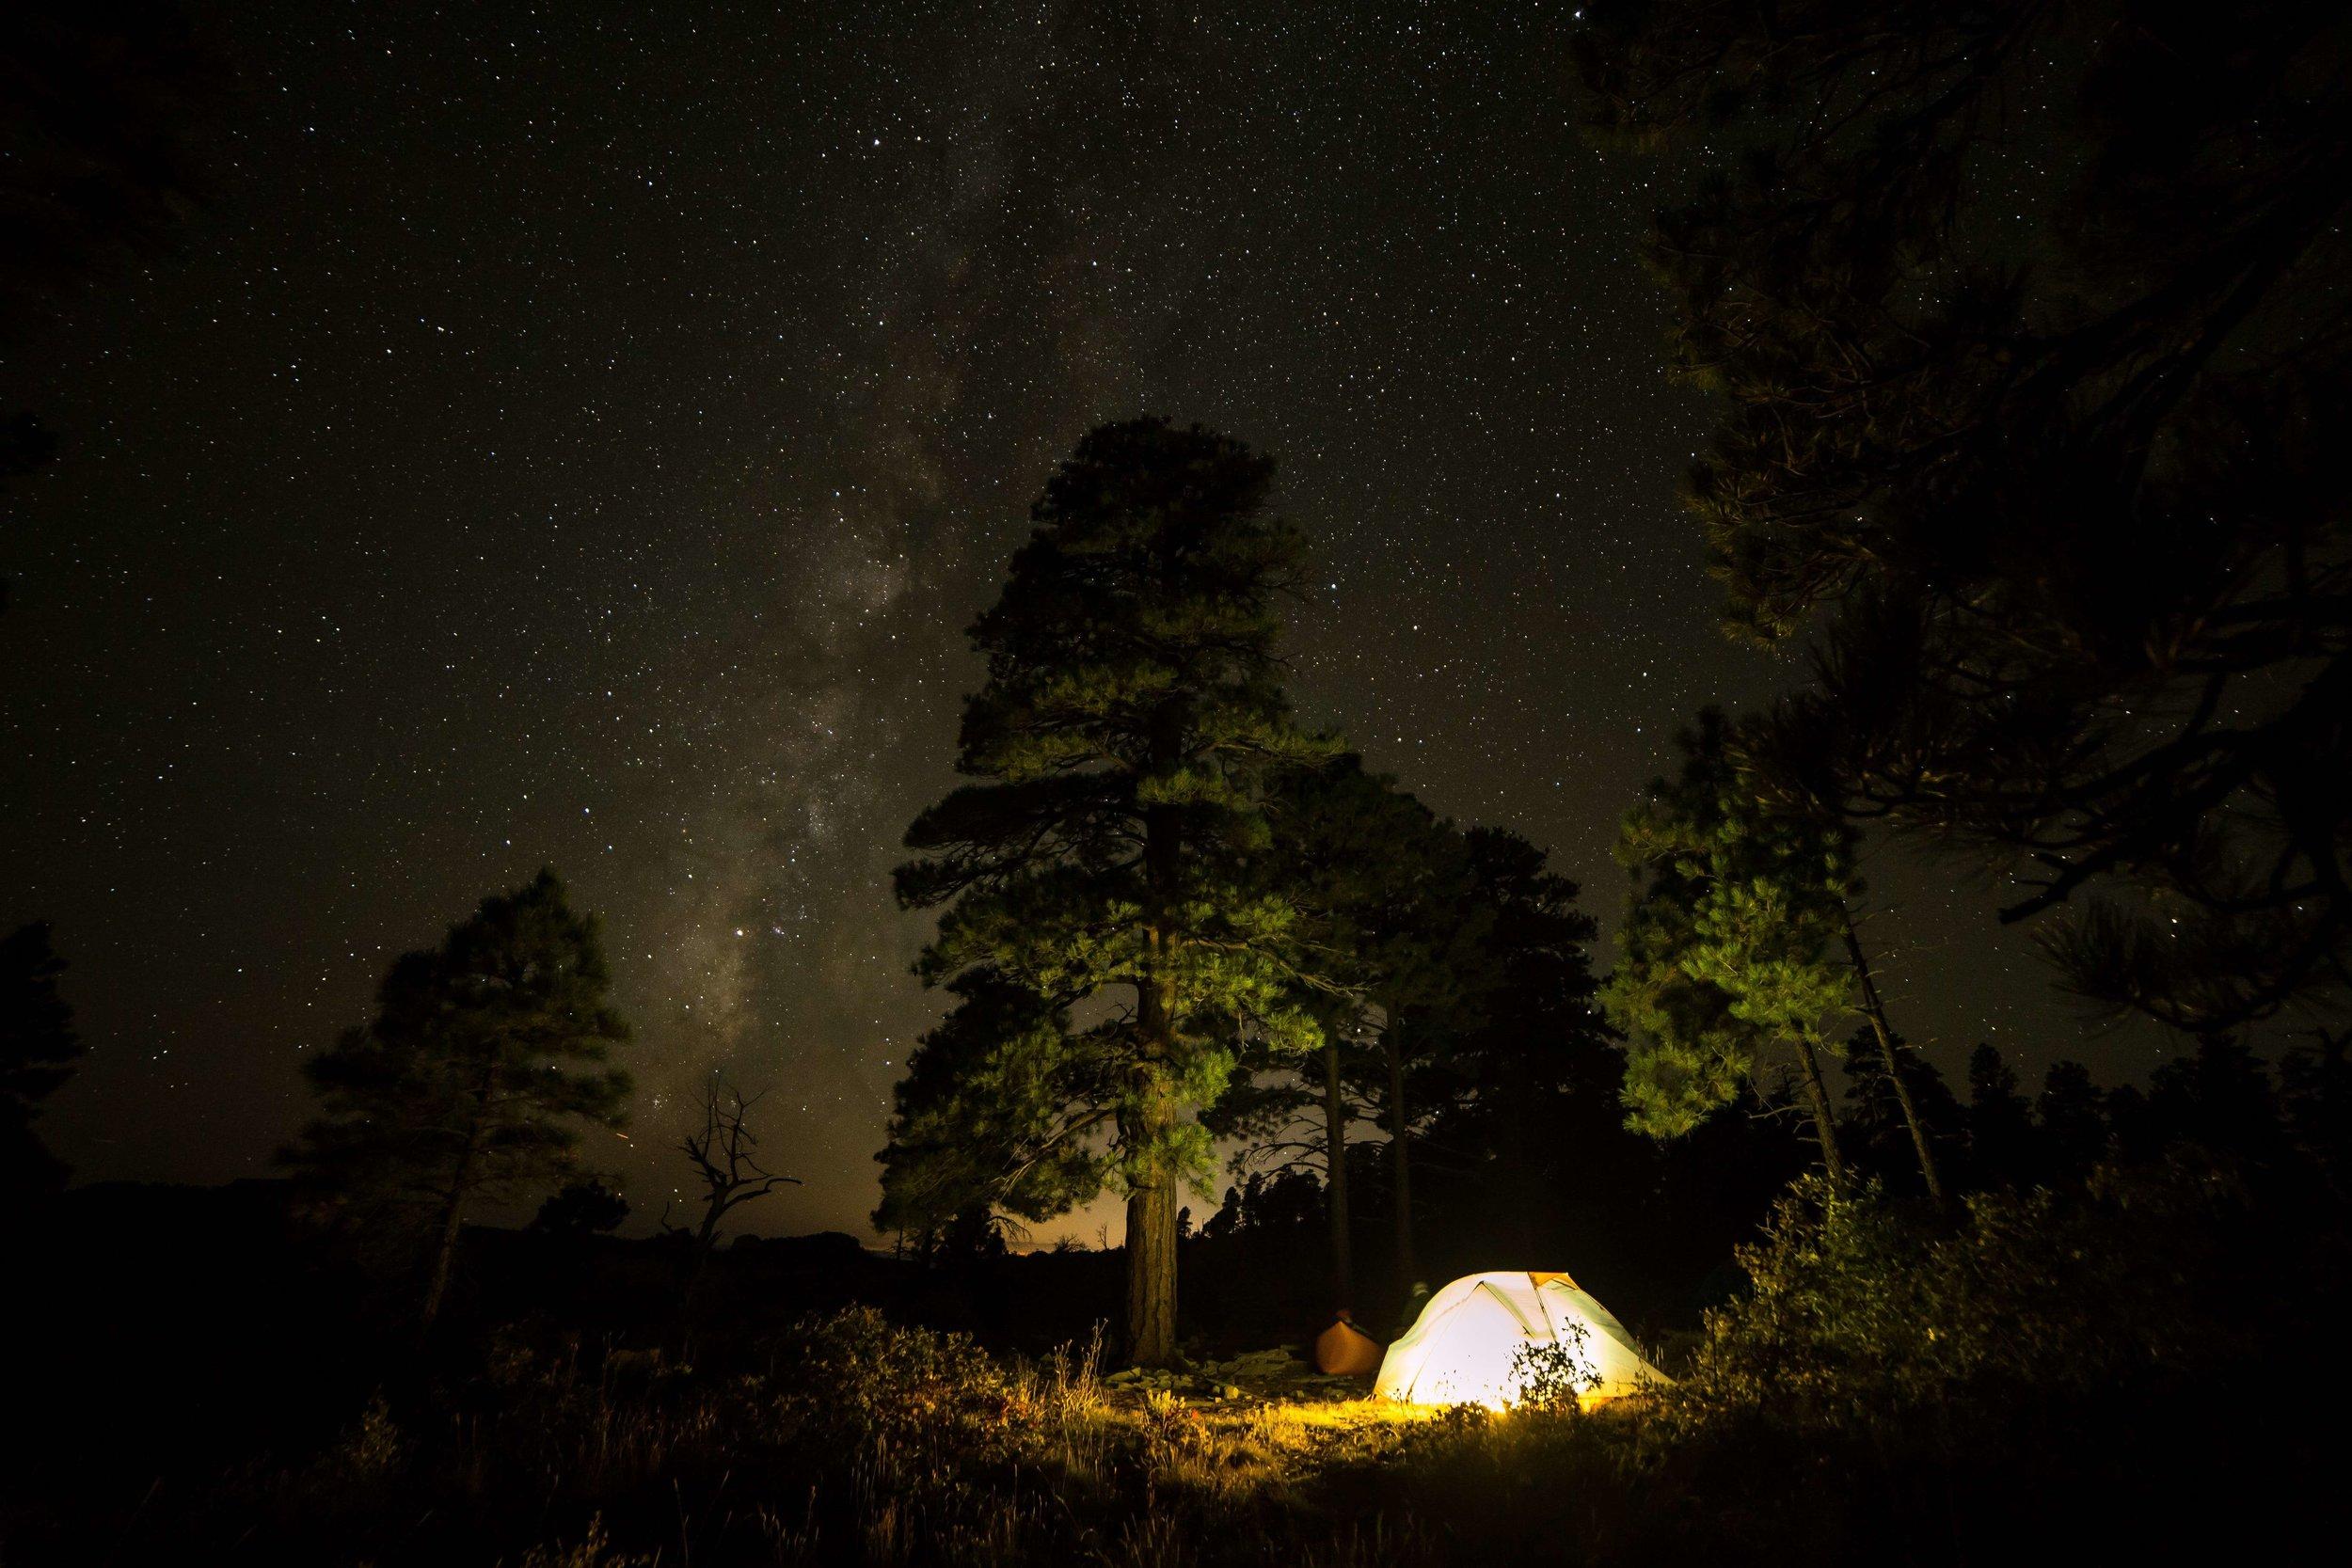 An illuminated tent under a starry night sky.